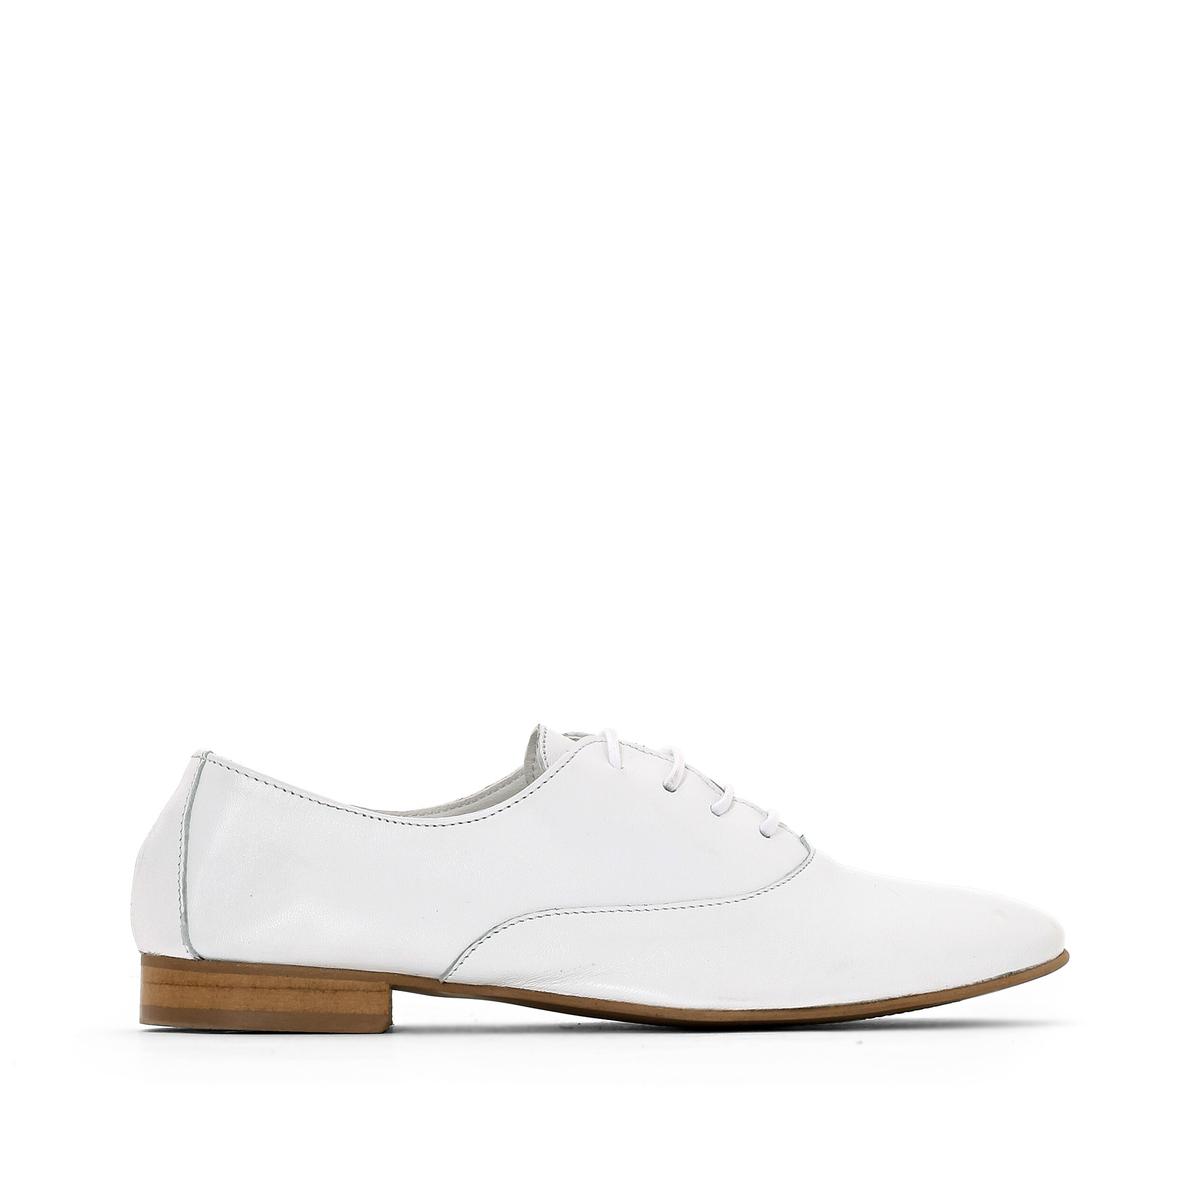 Ботинки-дерби La Redoute Из мягкой кожи 36 белый